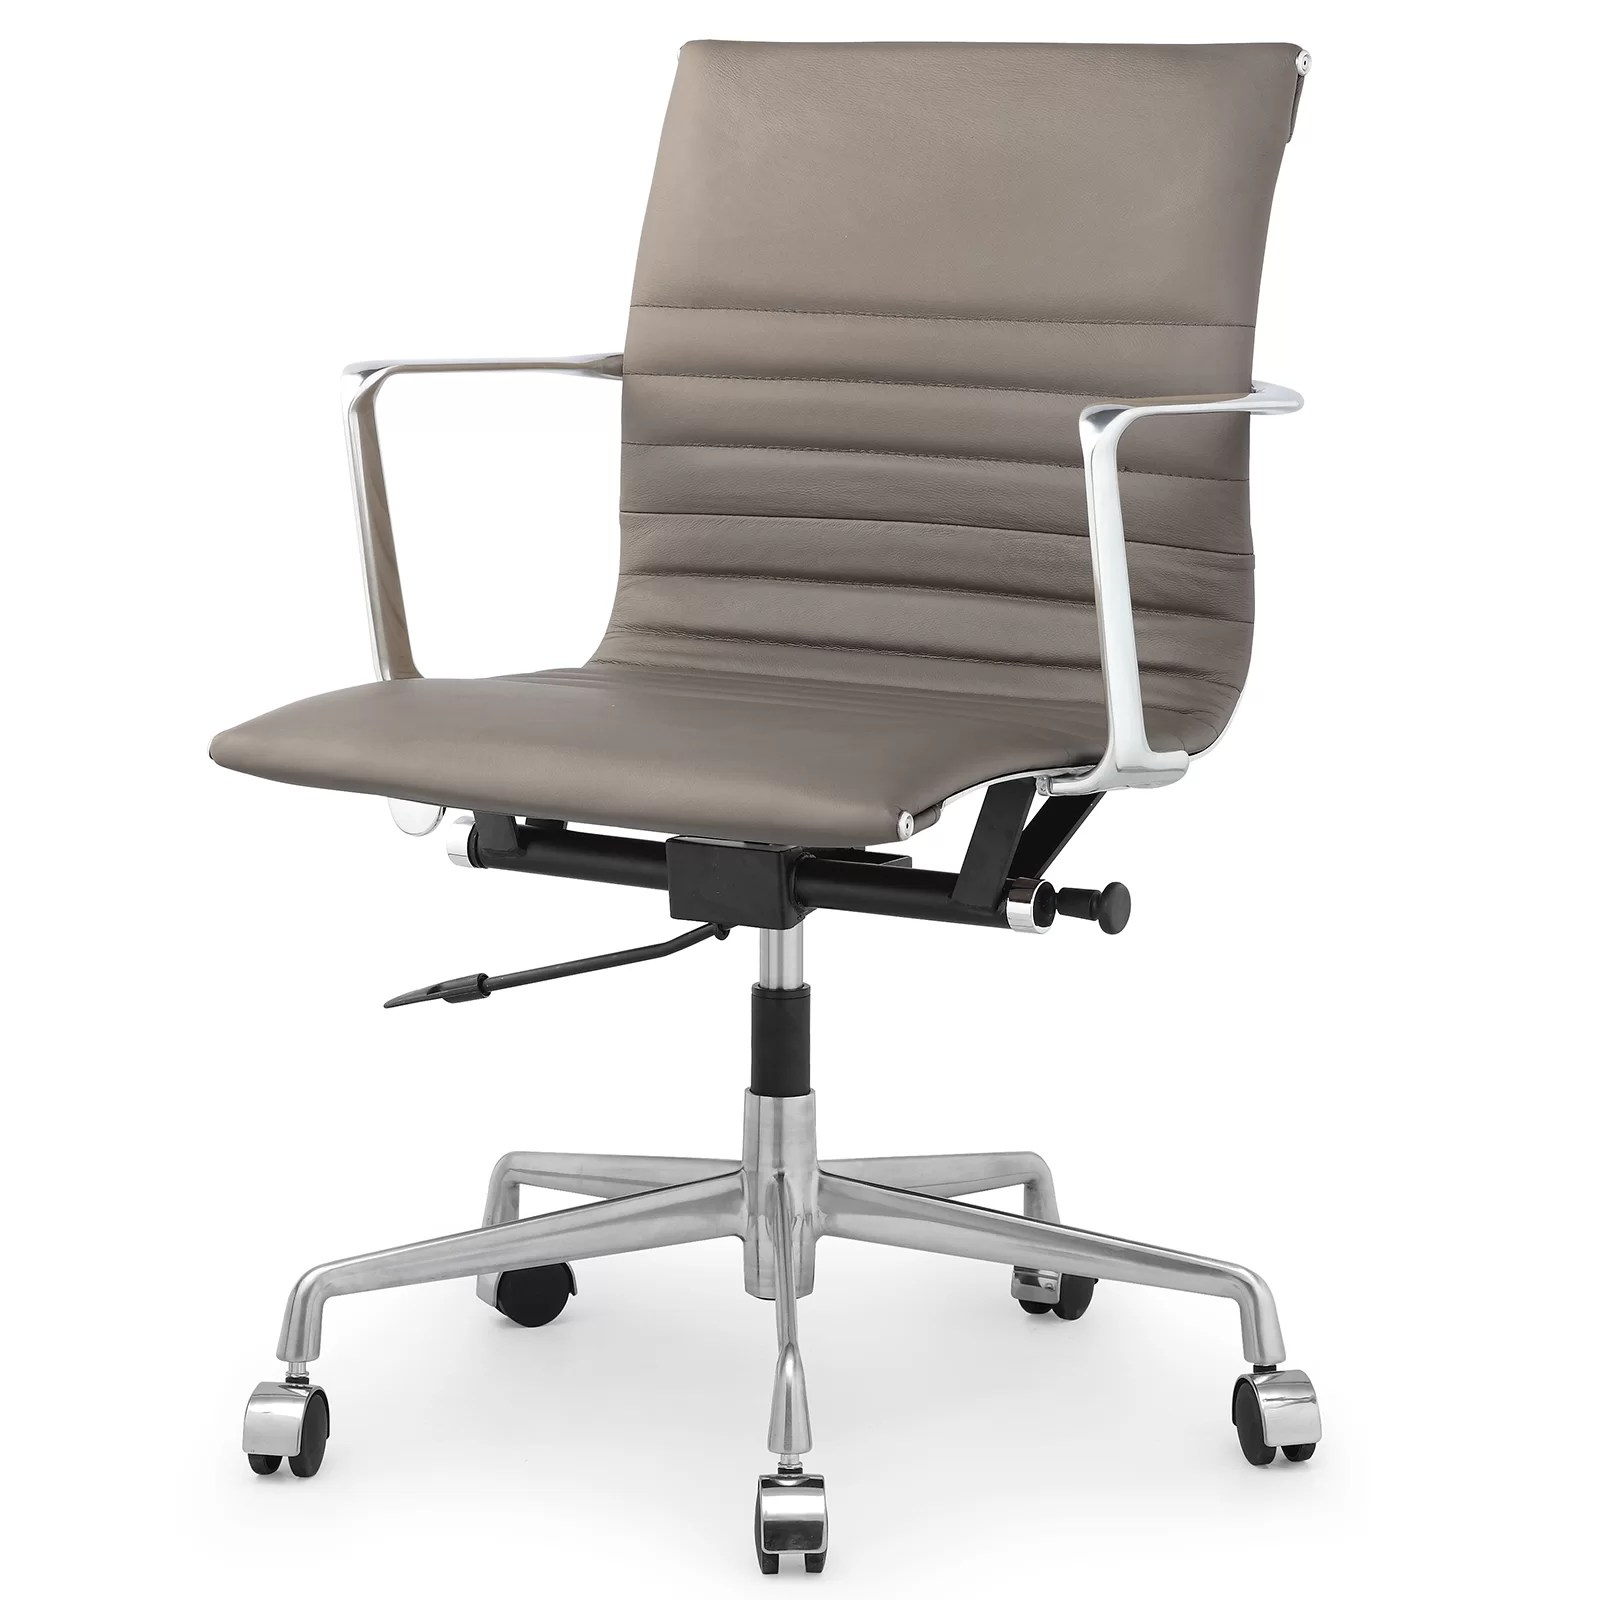 desk chair reviews tubular steel design meelano leather and wayfair